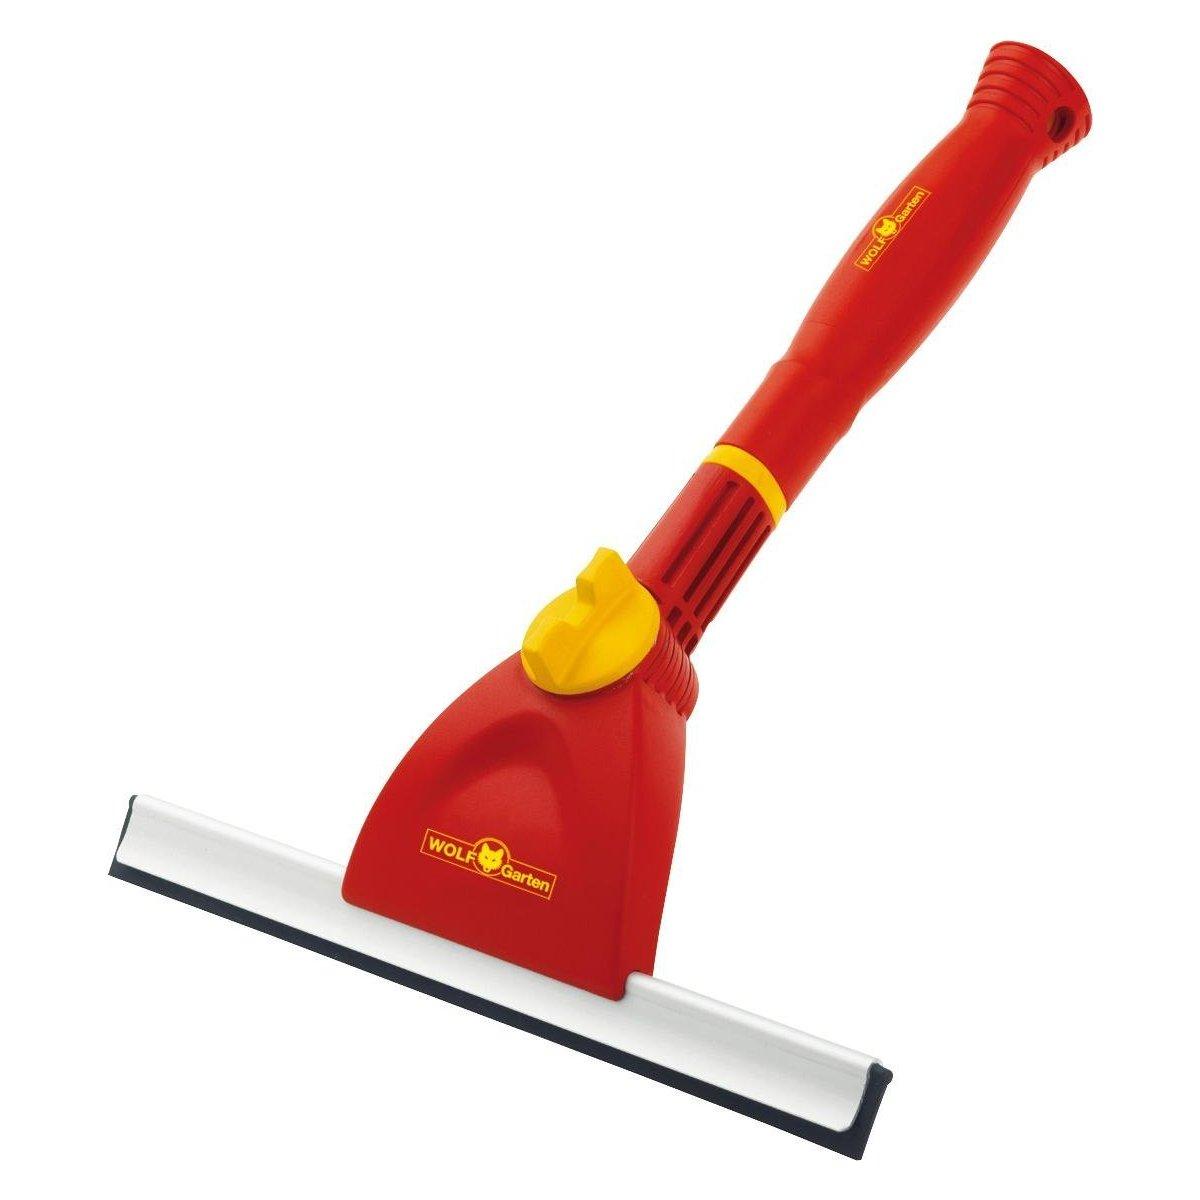 Red 59.2x7.84x3 cm WOLF-Garten FWM Multi-Change Window Wiper Cleaning Tool Head